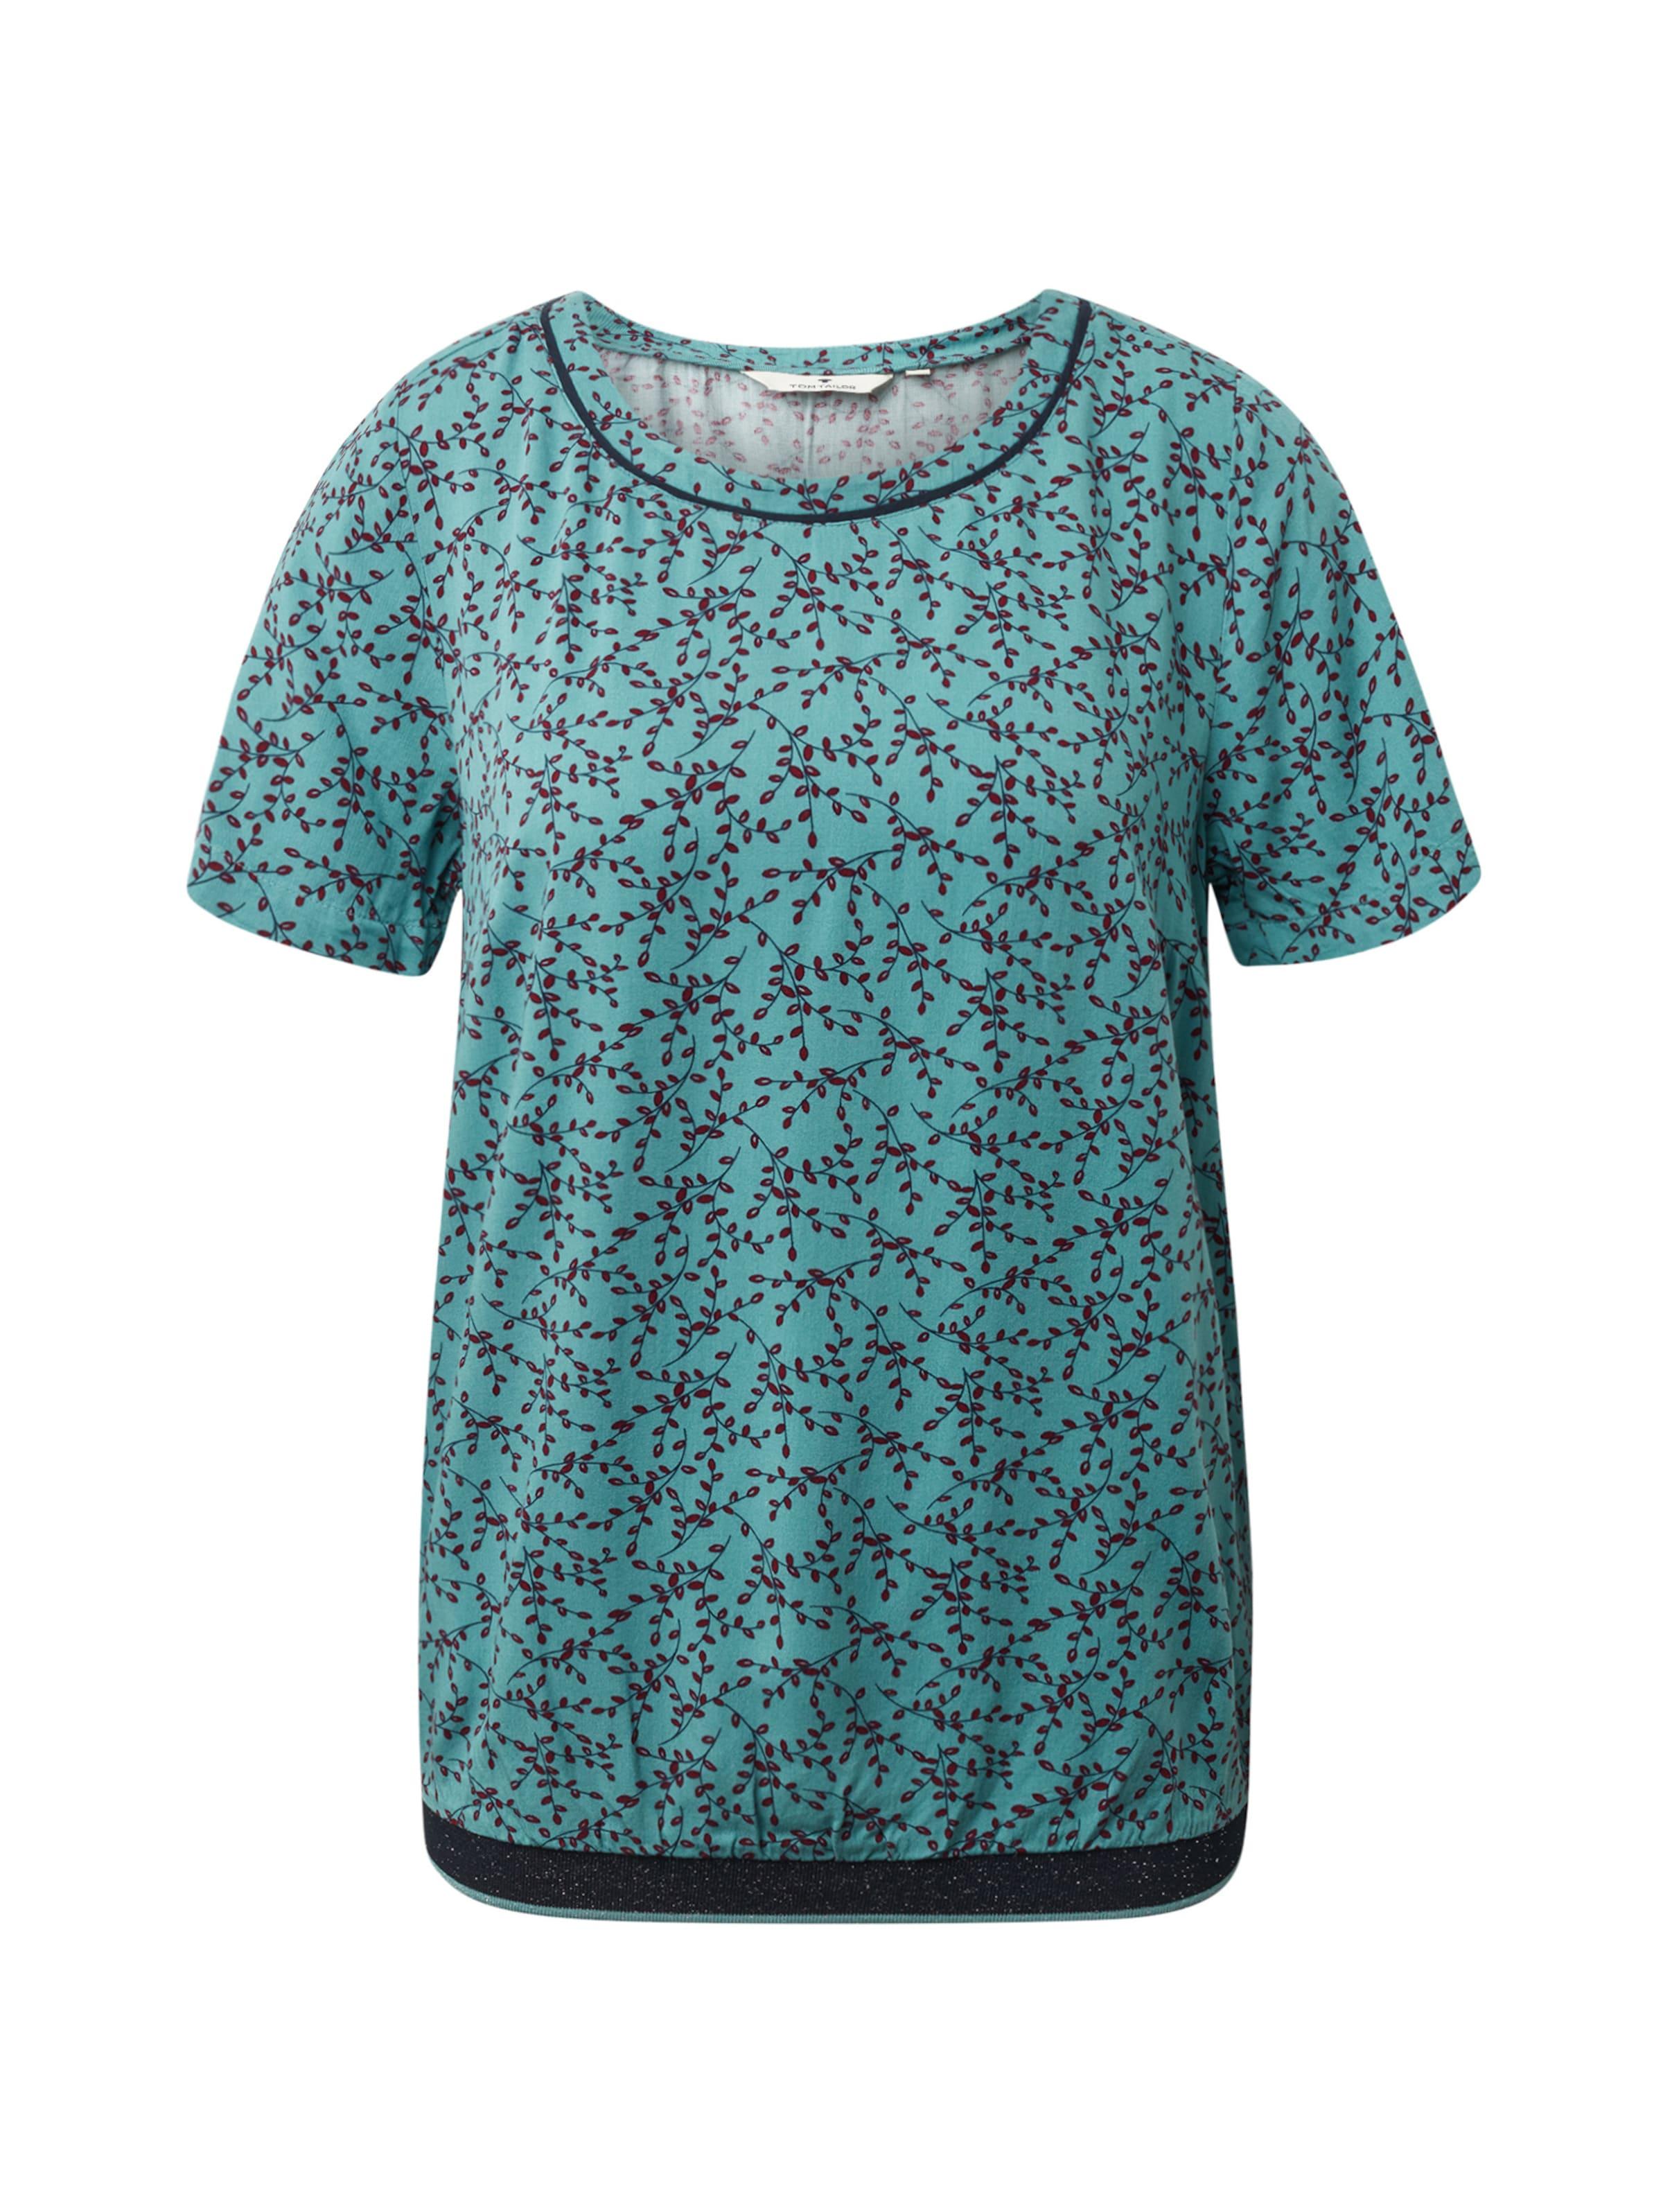 Tailor Tailor In MintSchwarz MintSchwarz Bluse Bluse In Tom Tom Tailor Tom PilukXZwOT